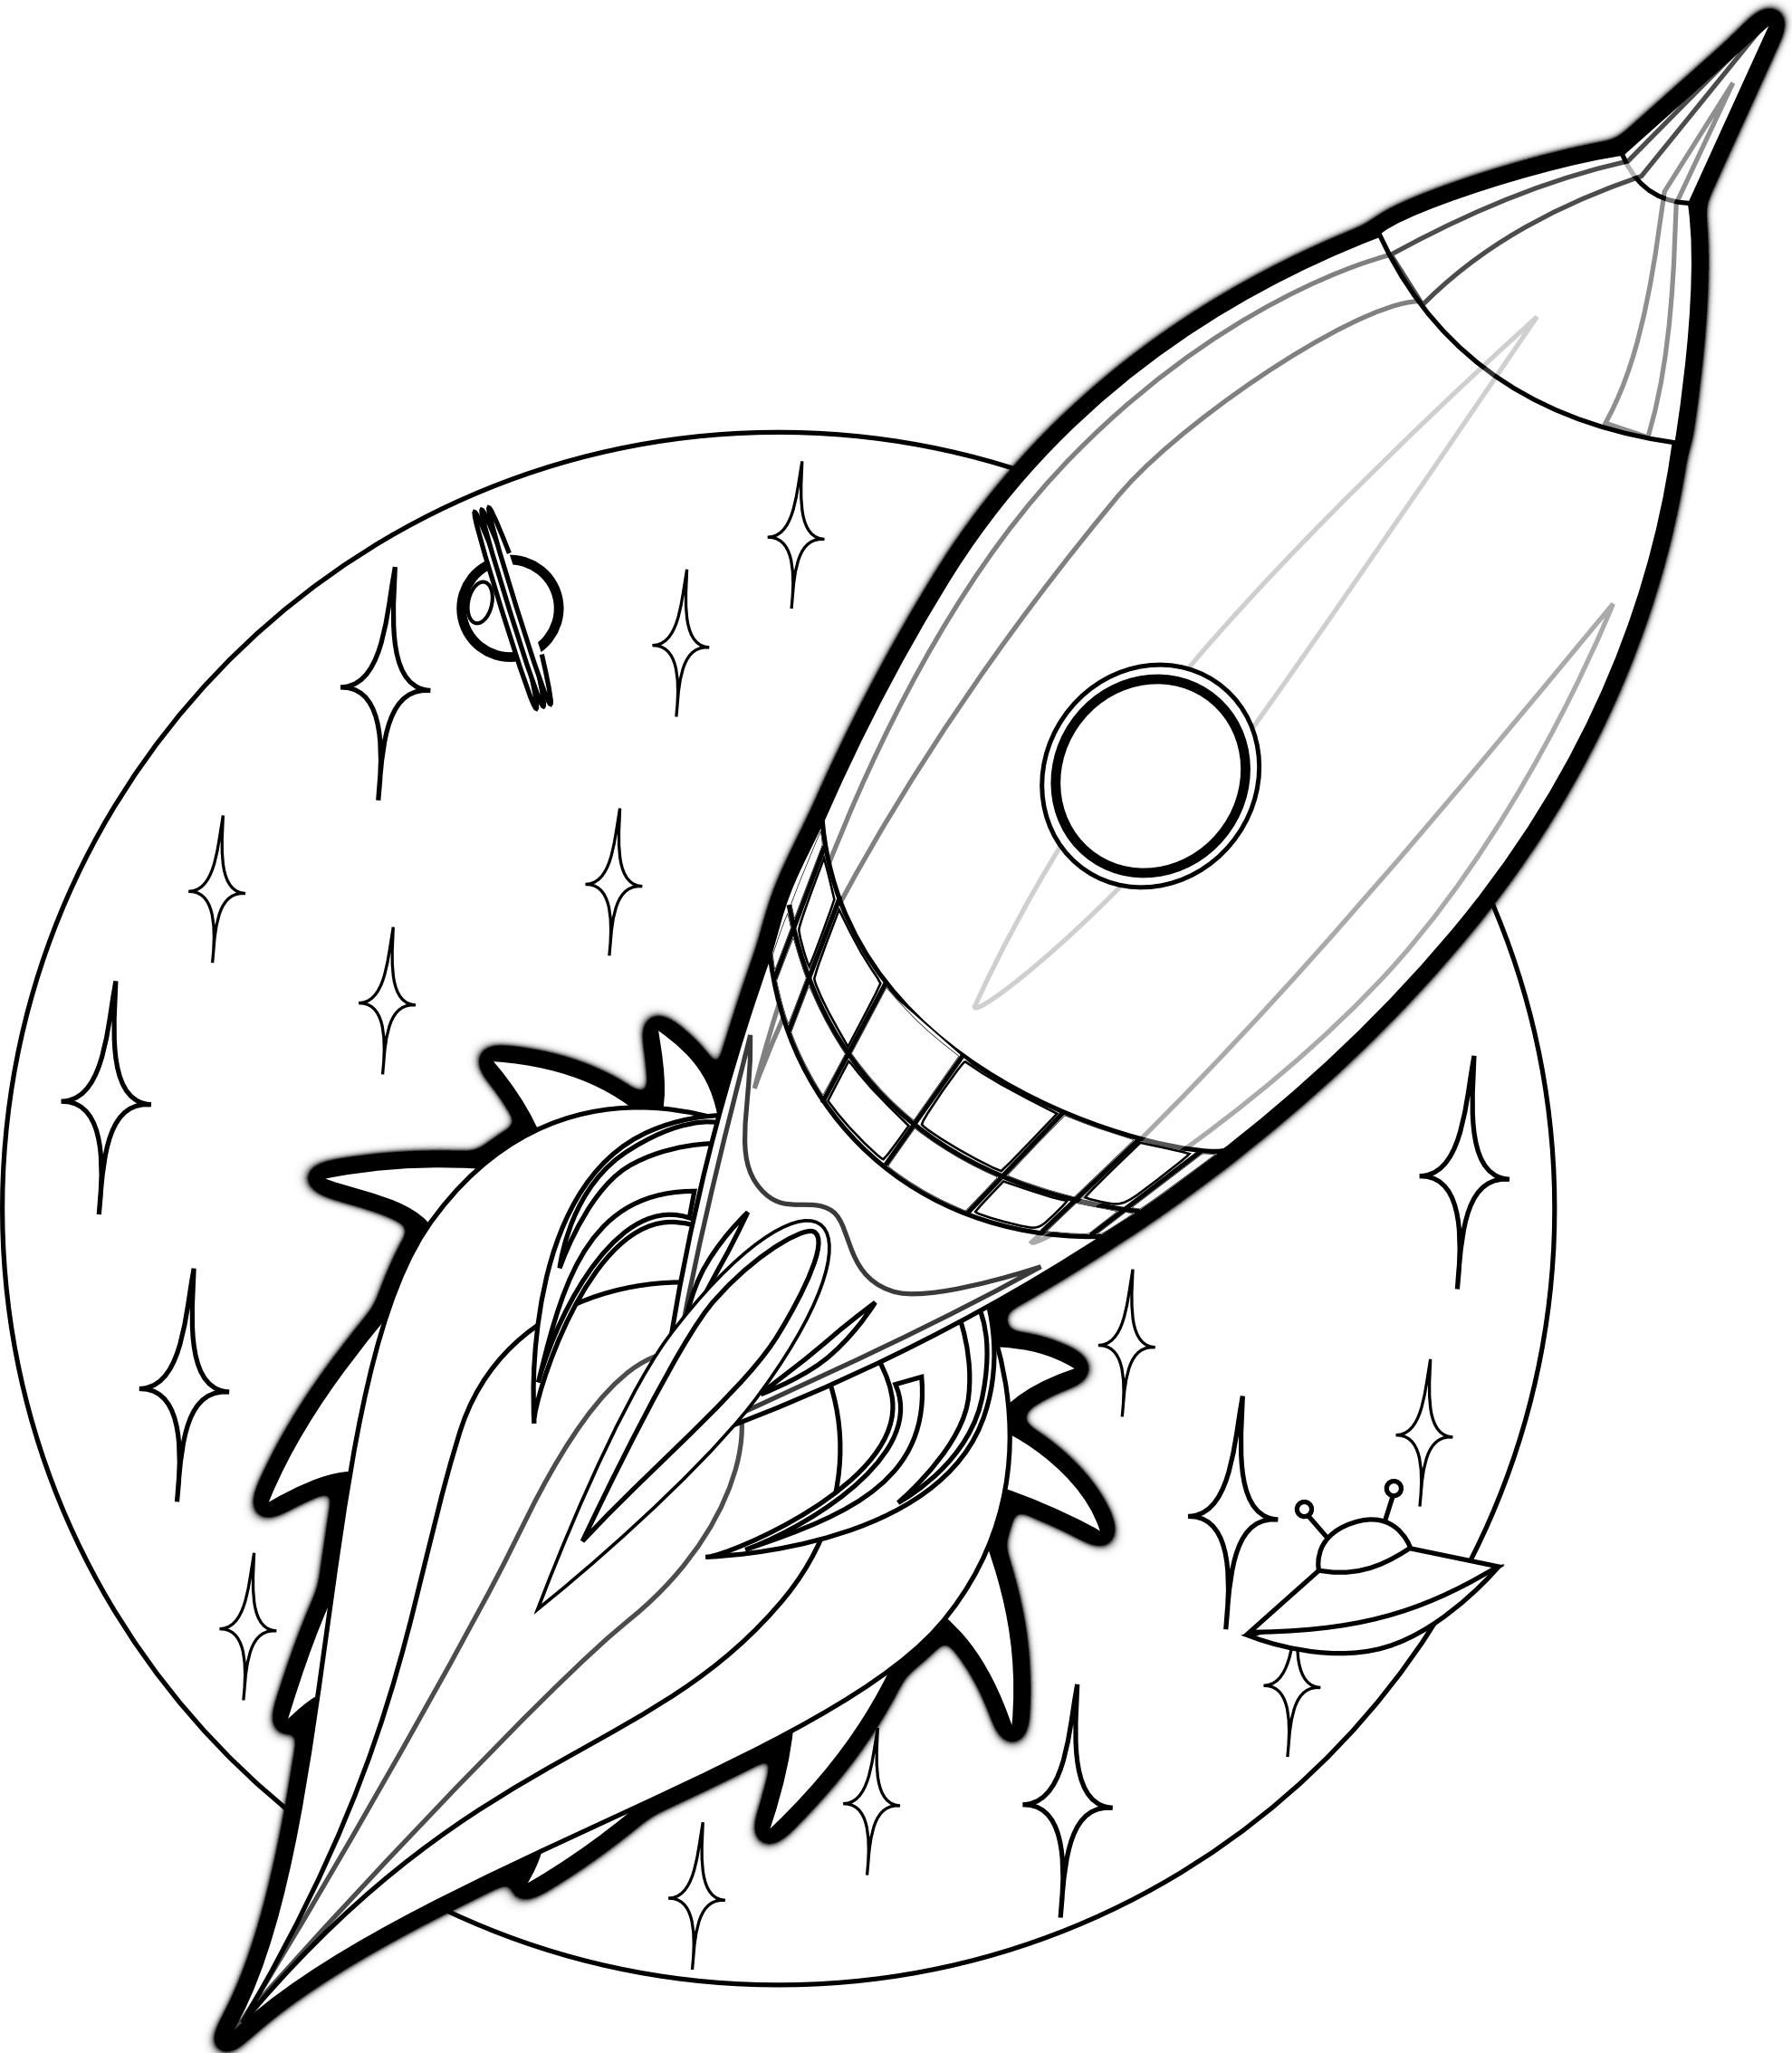 printable coloring pages rocket ship printable rocket ship coloring pages for kids cool2bkids printable rocket pages coloring ship